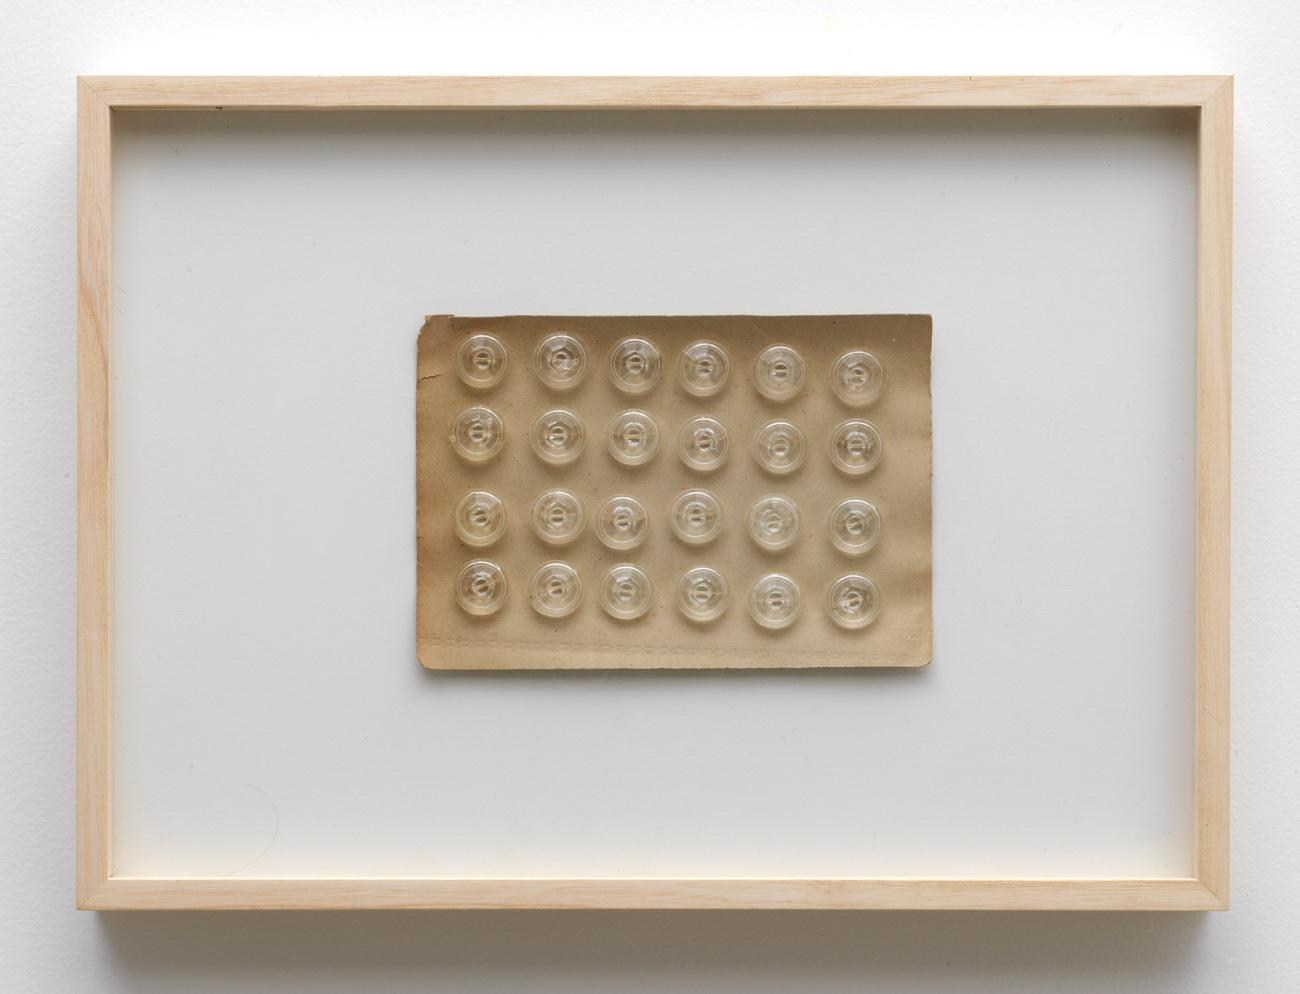 herman de vries, untitled, 2015